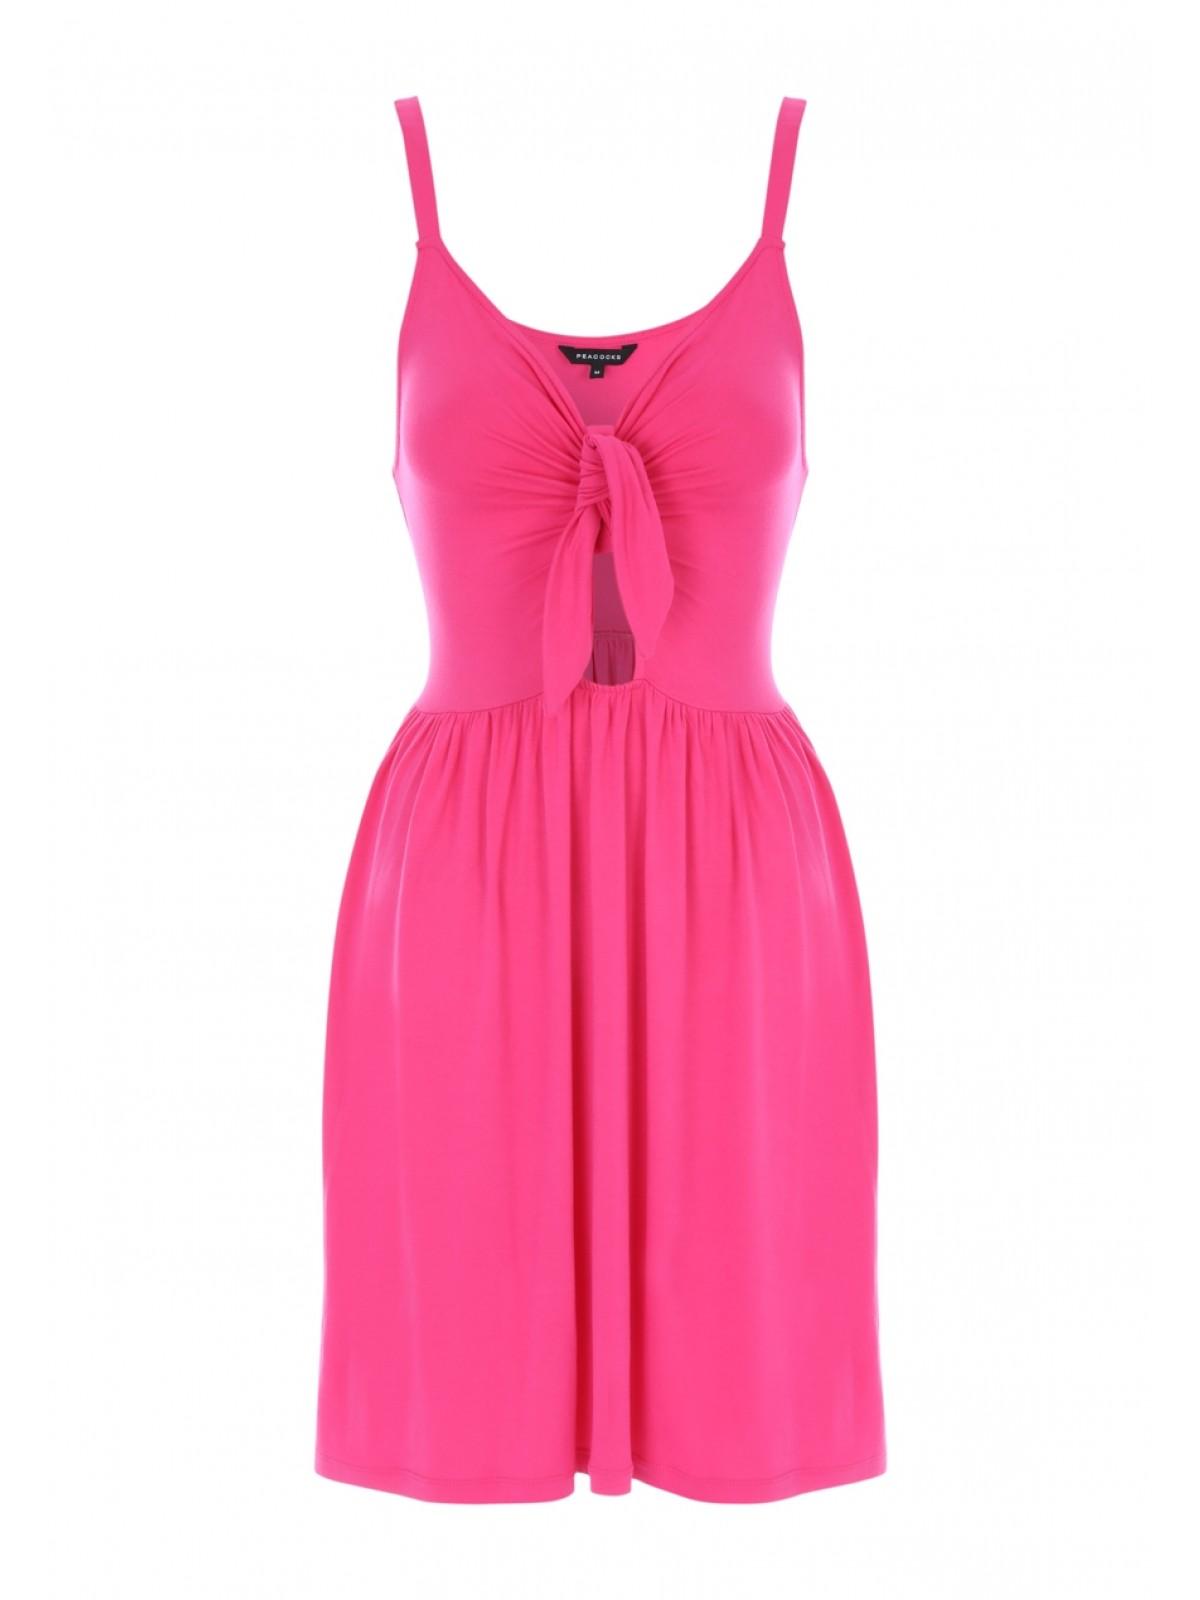 Peacocks short pink dress.jpg